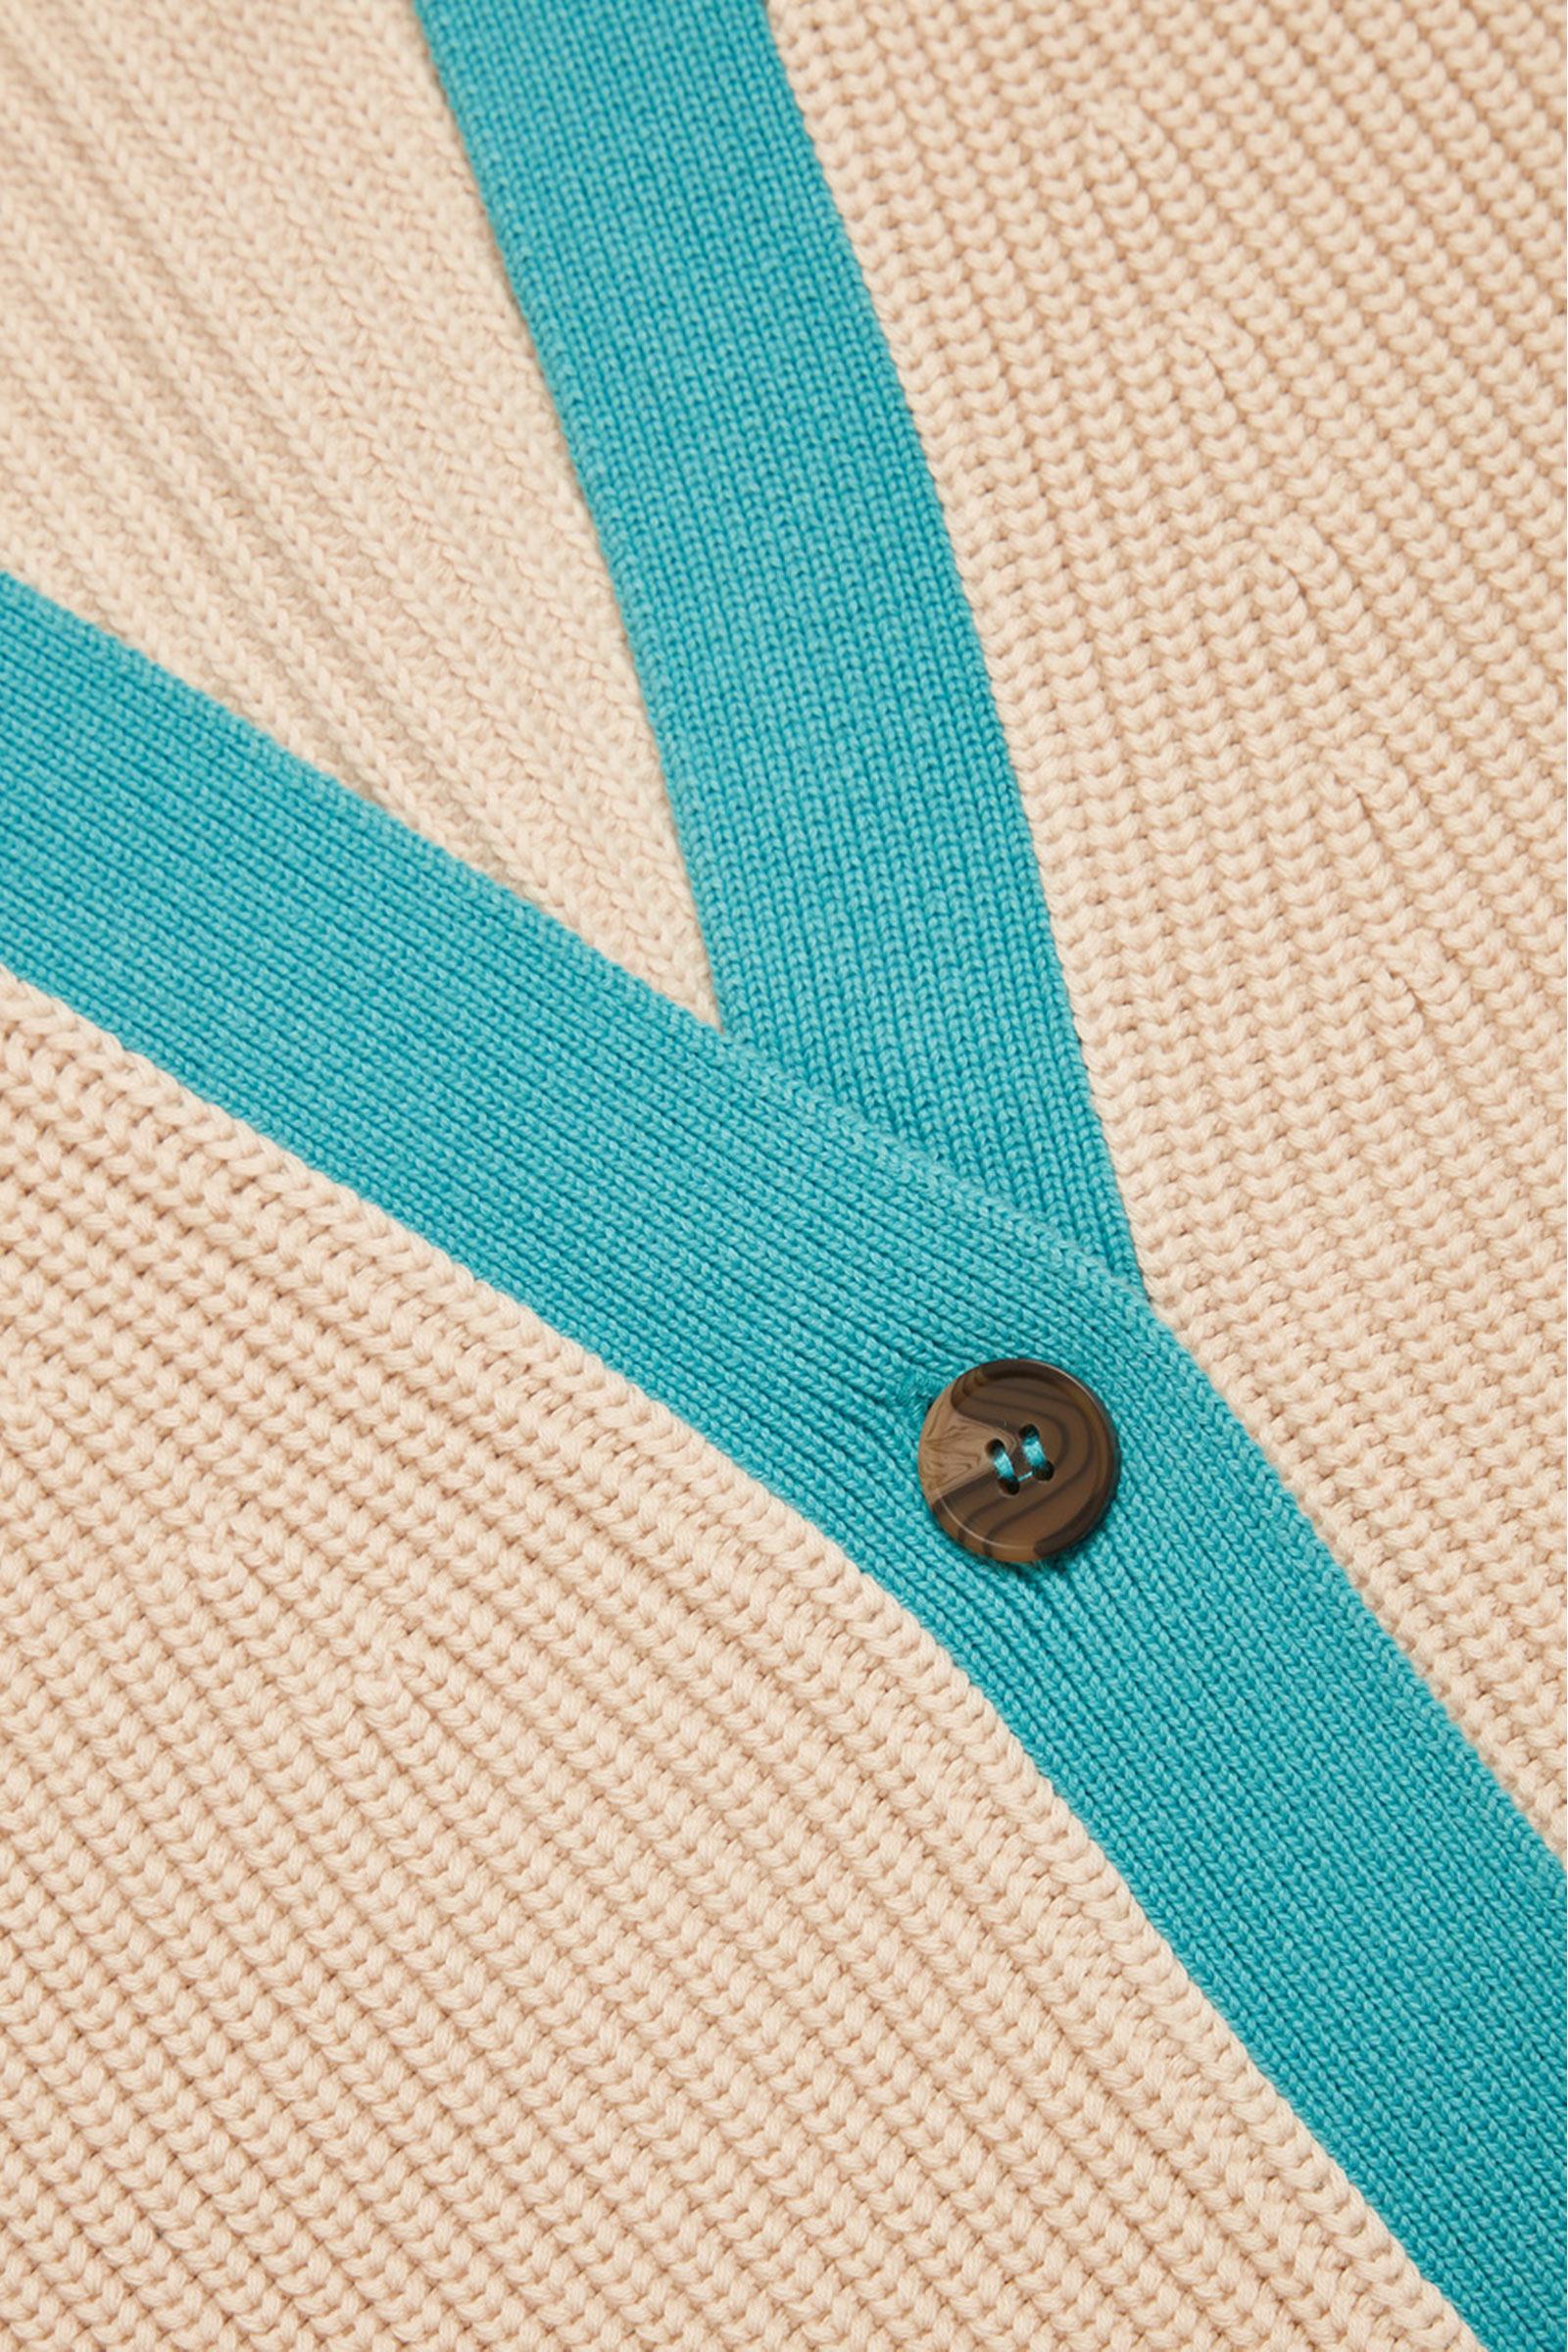 COS 자카드 니트 가디건의 터쿼이즈컬러 Detail입니다.